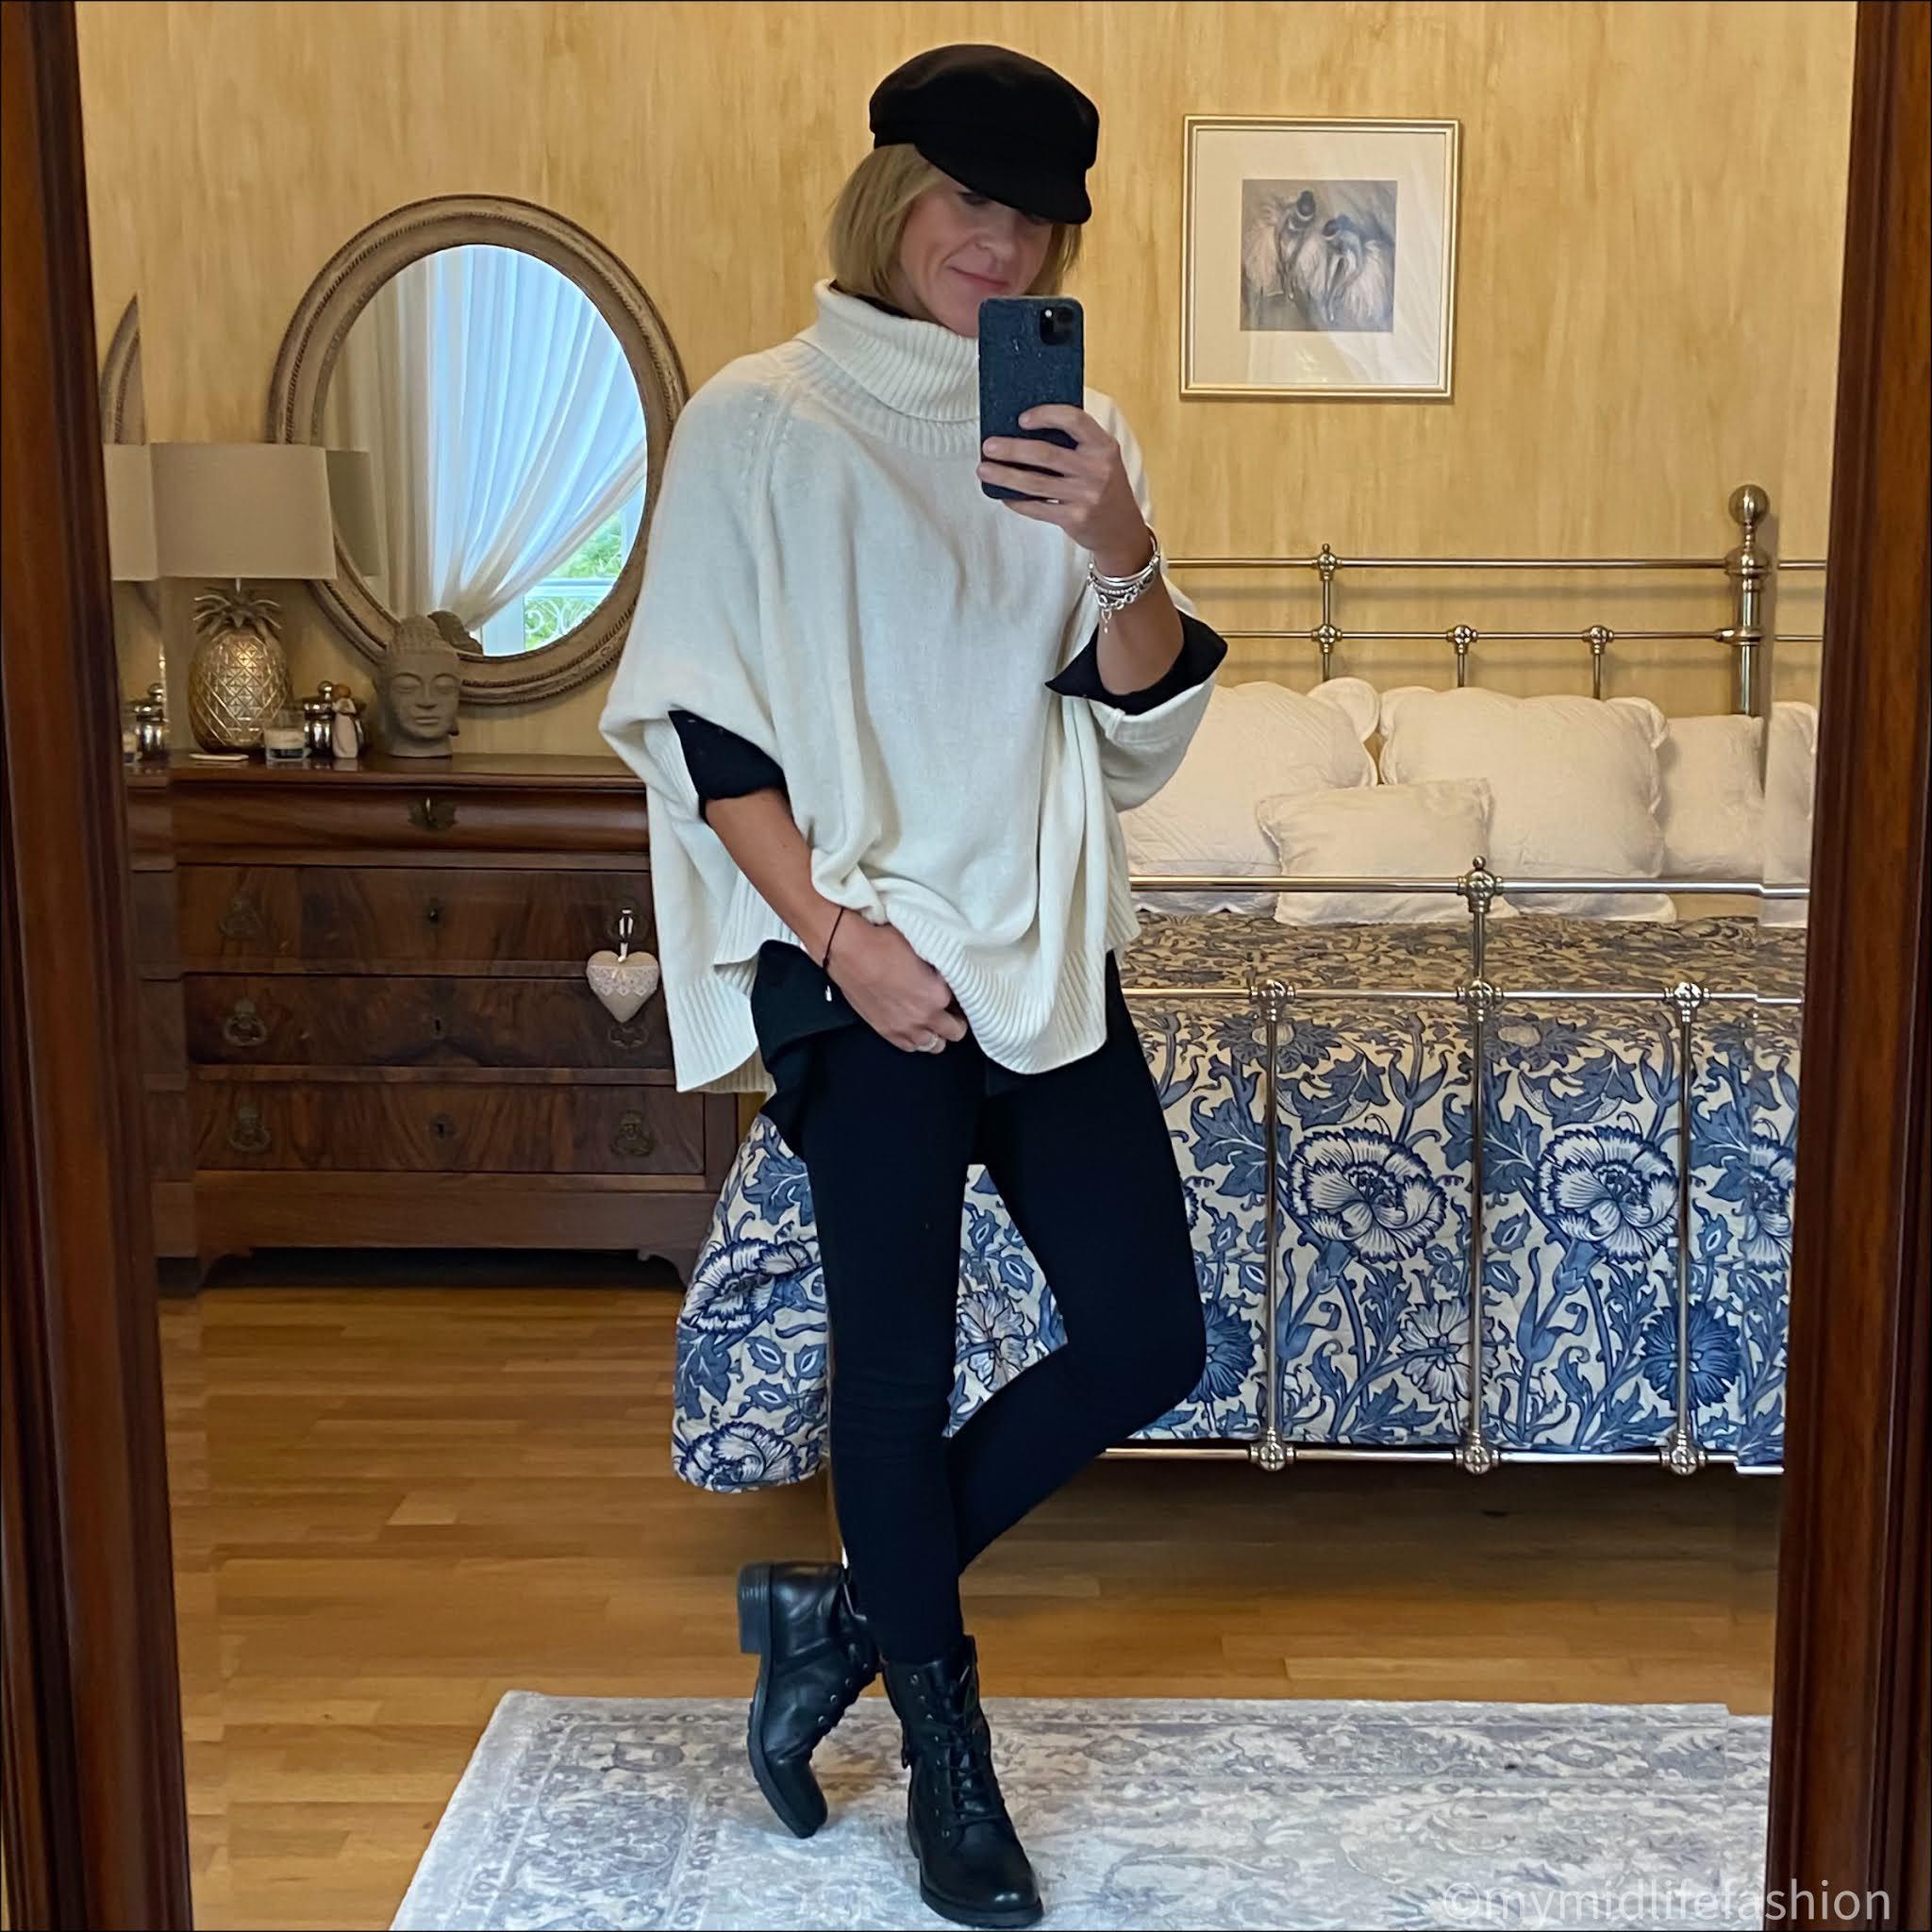 my midlife fashion, pink avocet sloppy Joe cashmere jersey, Carl Scarpa paulette black ankle boots, j crew 8 inch toothpick skinny jeans, zara oversized shirt, Isabel Marant baker boy cap